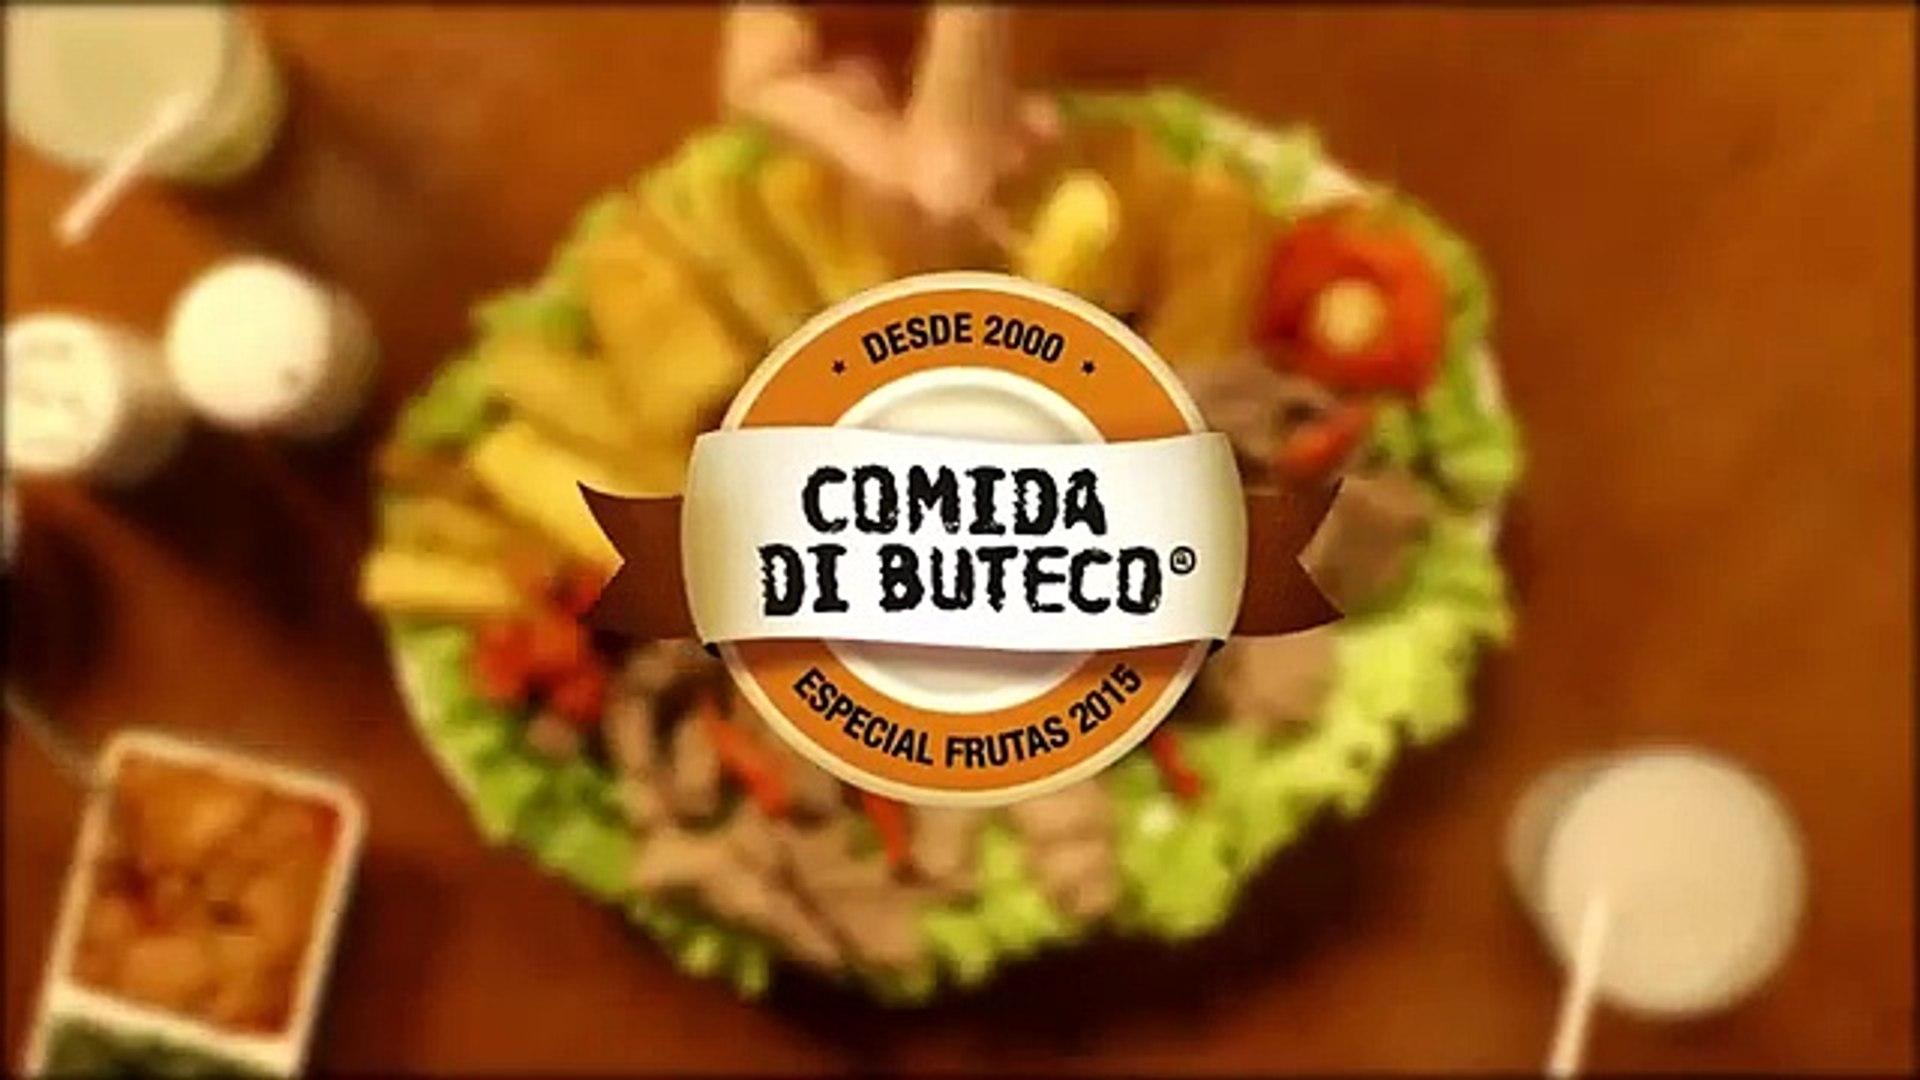 Quiosque da Horta - Comida di Buteco 2015 - Campinas/SP